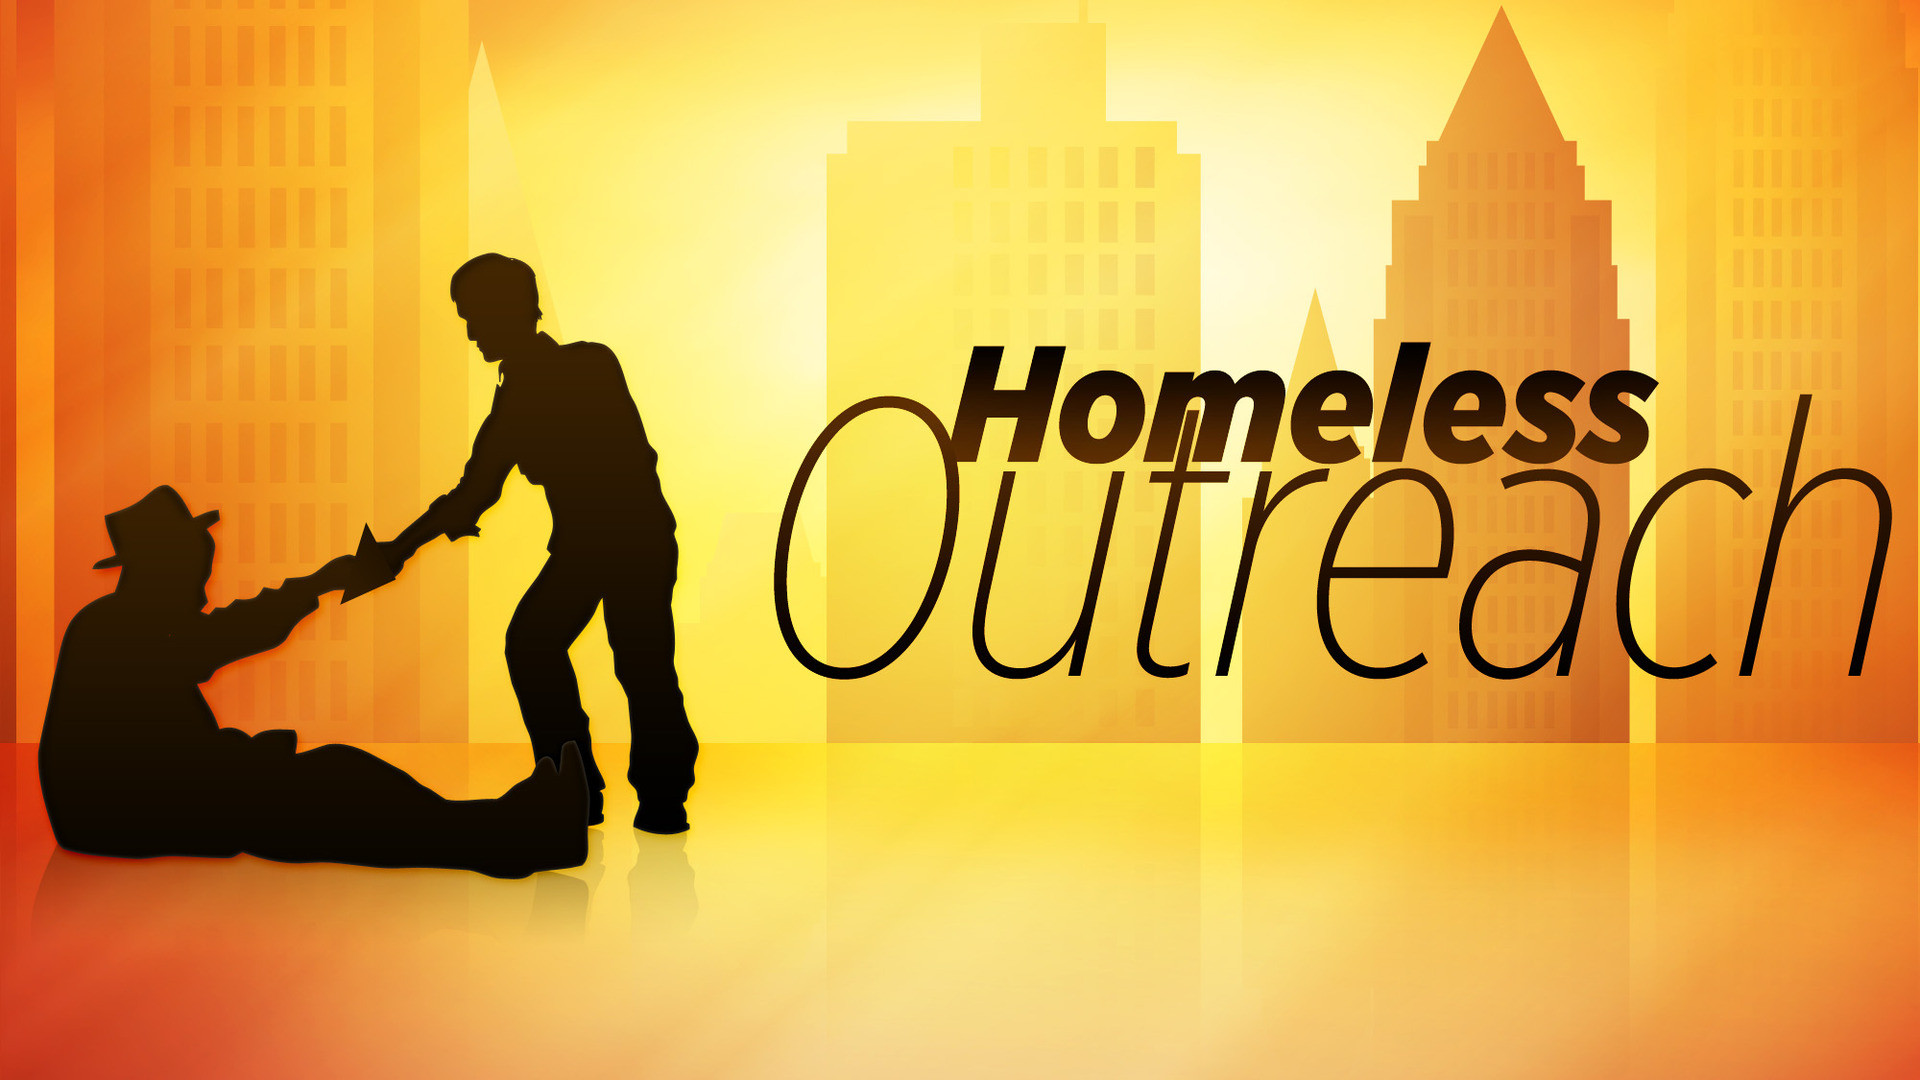 homeless_outreach-title-2-Wide 16x9.jpg